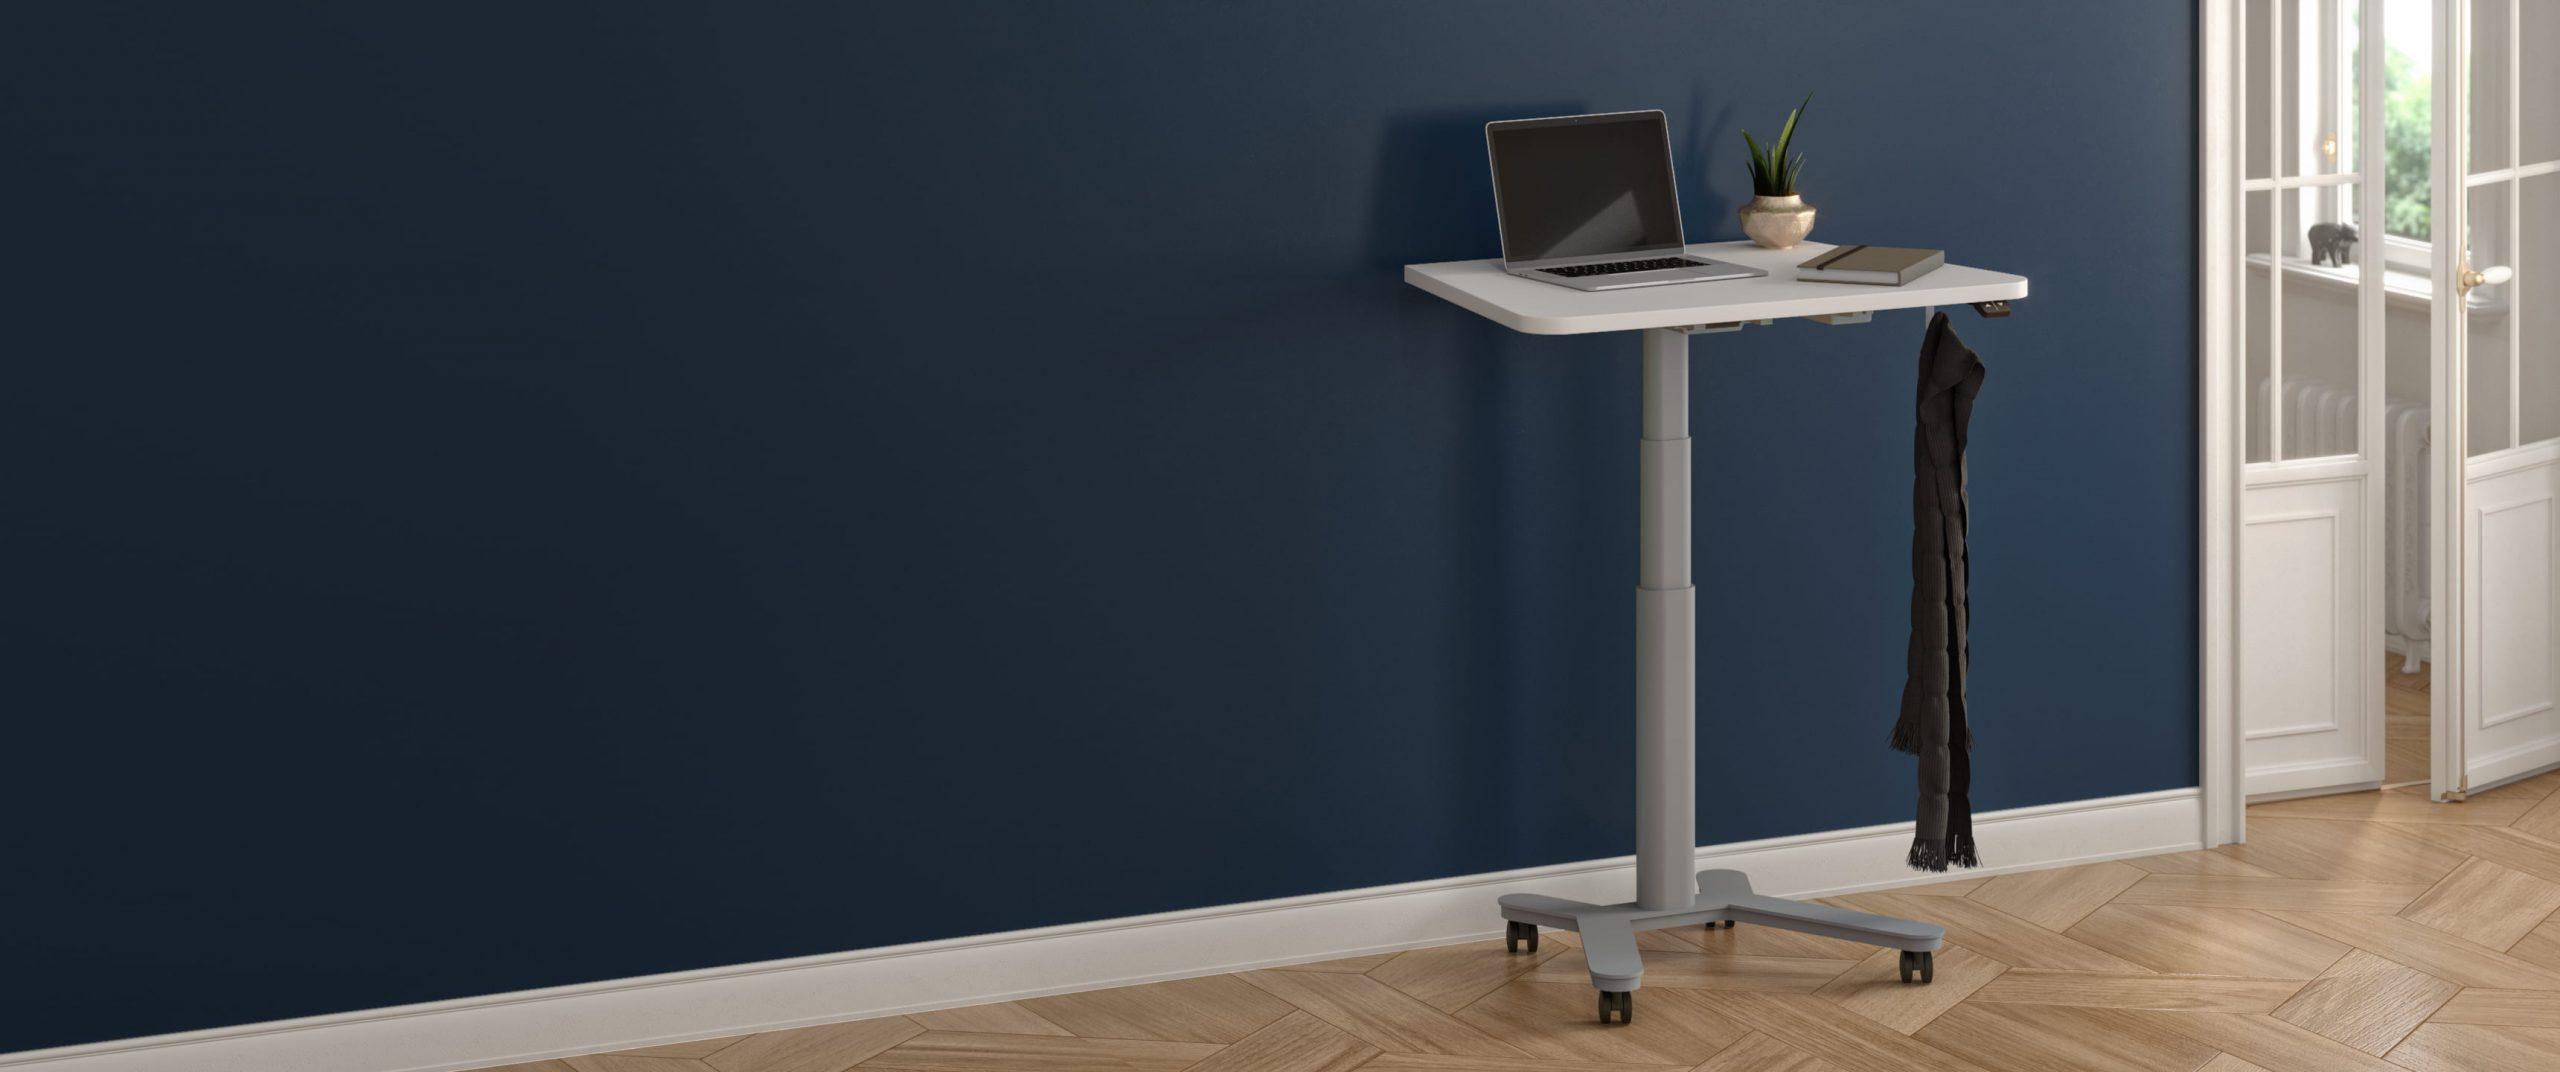 New standing desk